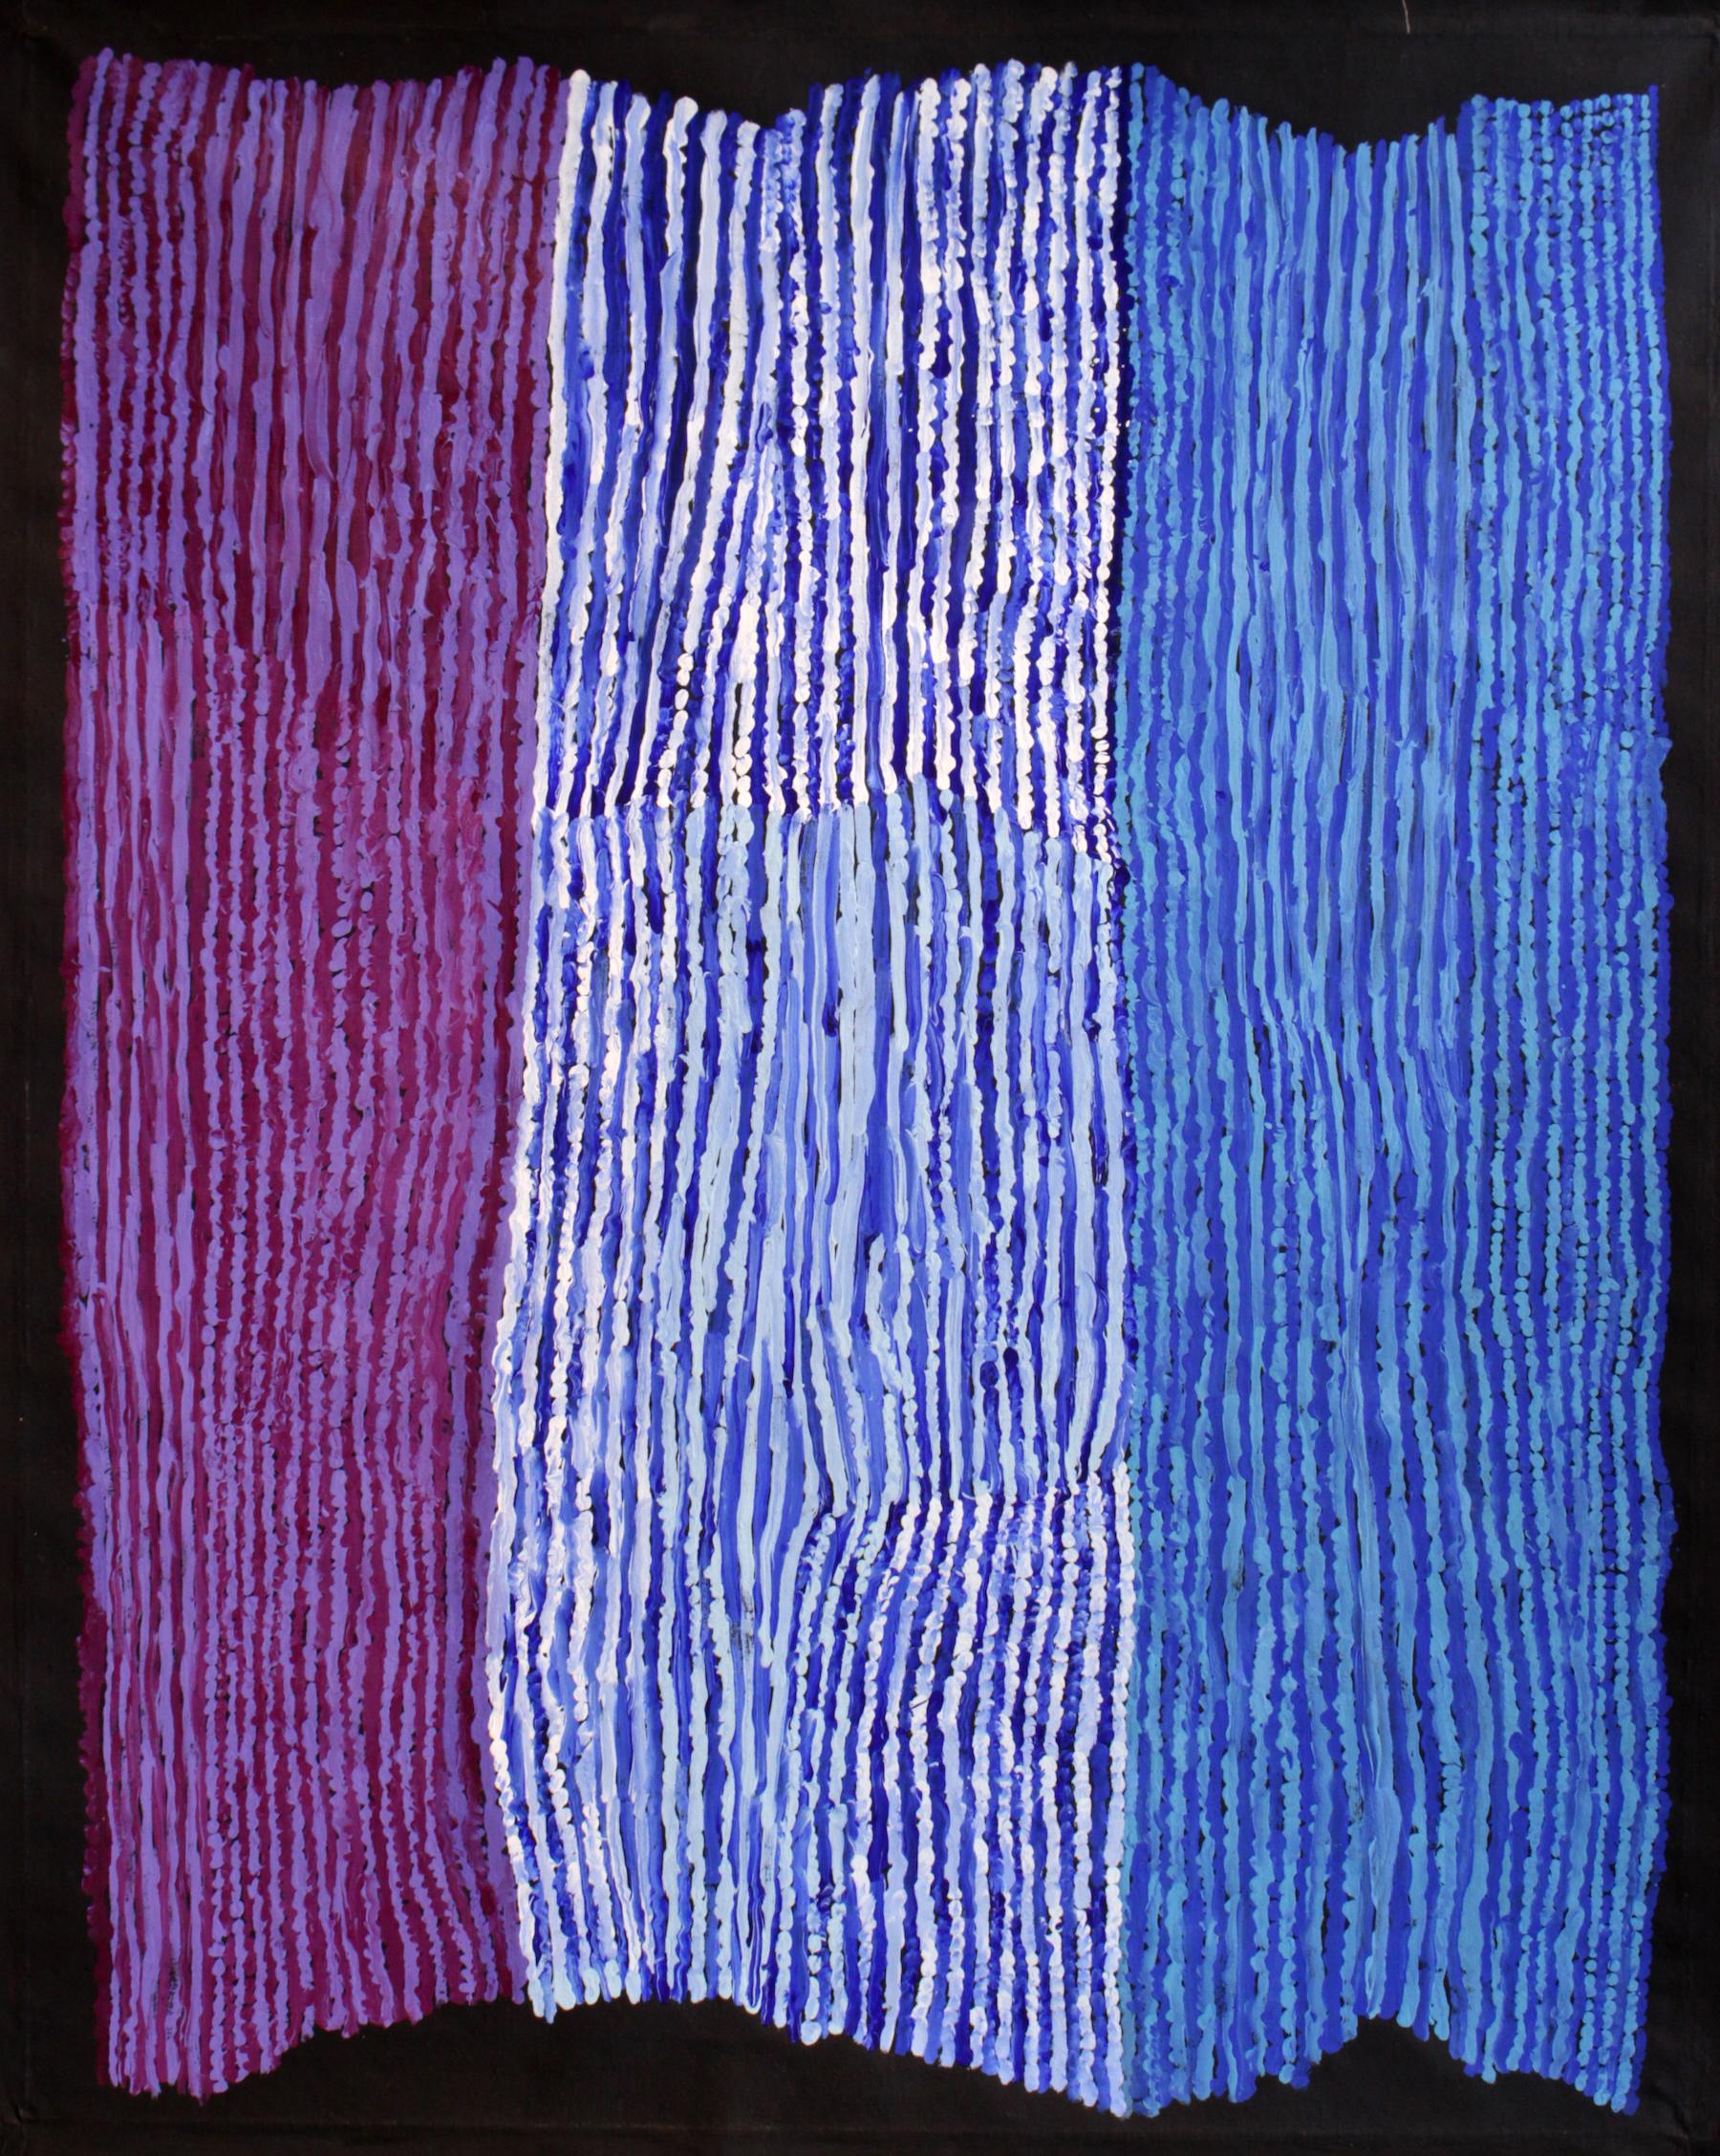 "Ray Ken  Tali - Sand dune  Acrylic on Belgian linen 59.8"" x 48"" (152 x 122 cm) Tjala Arts Catalog #434-16   EMAIL INQUIRY"